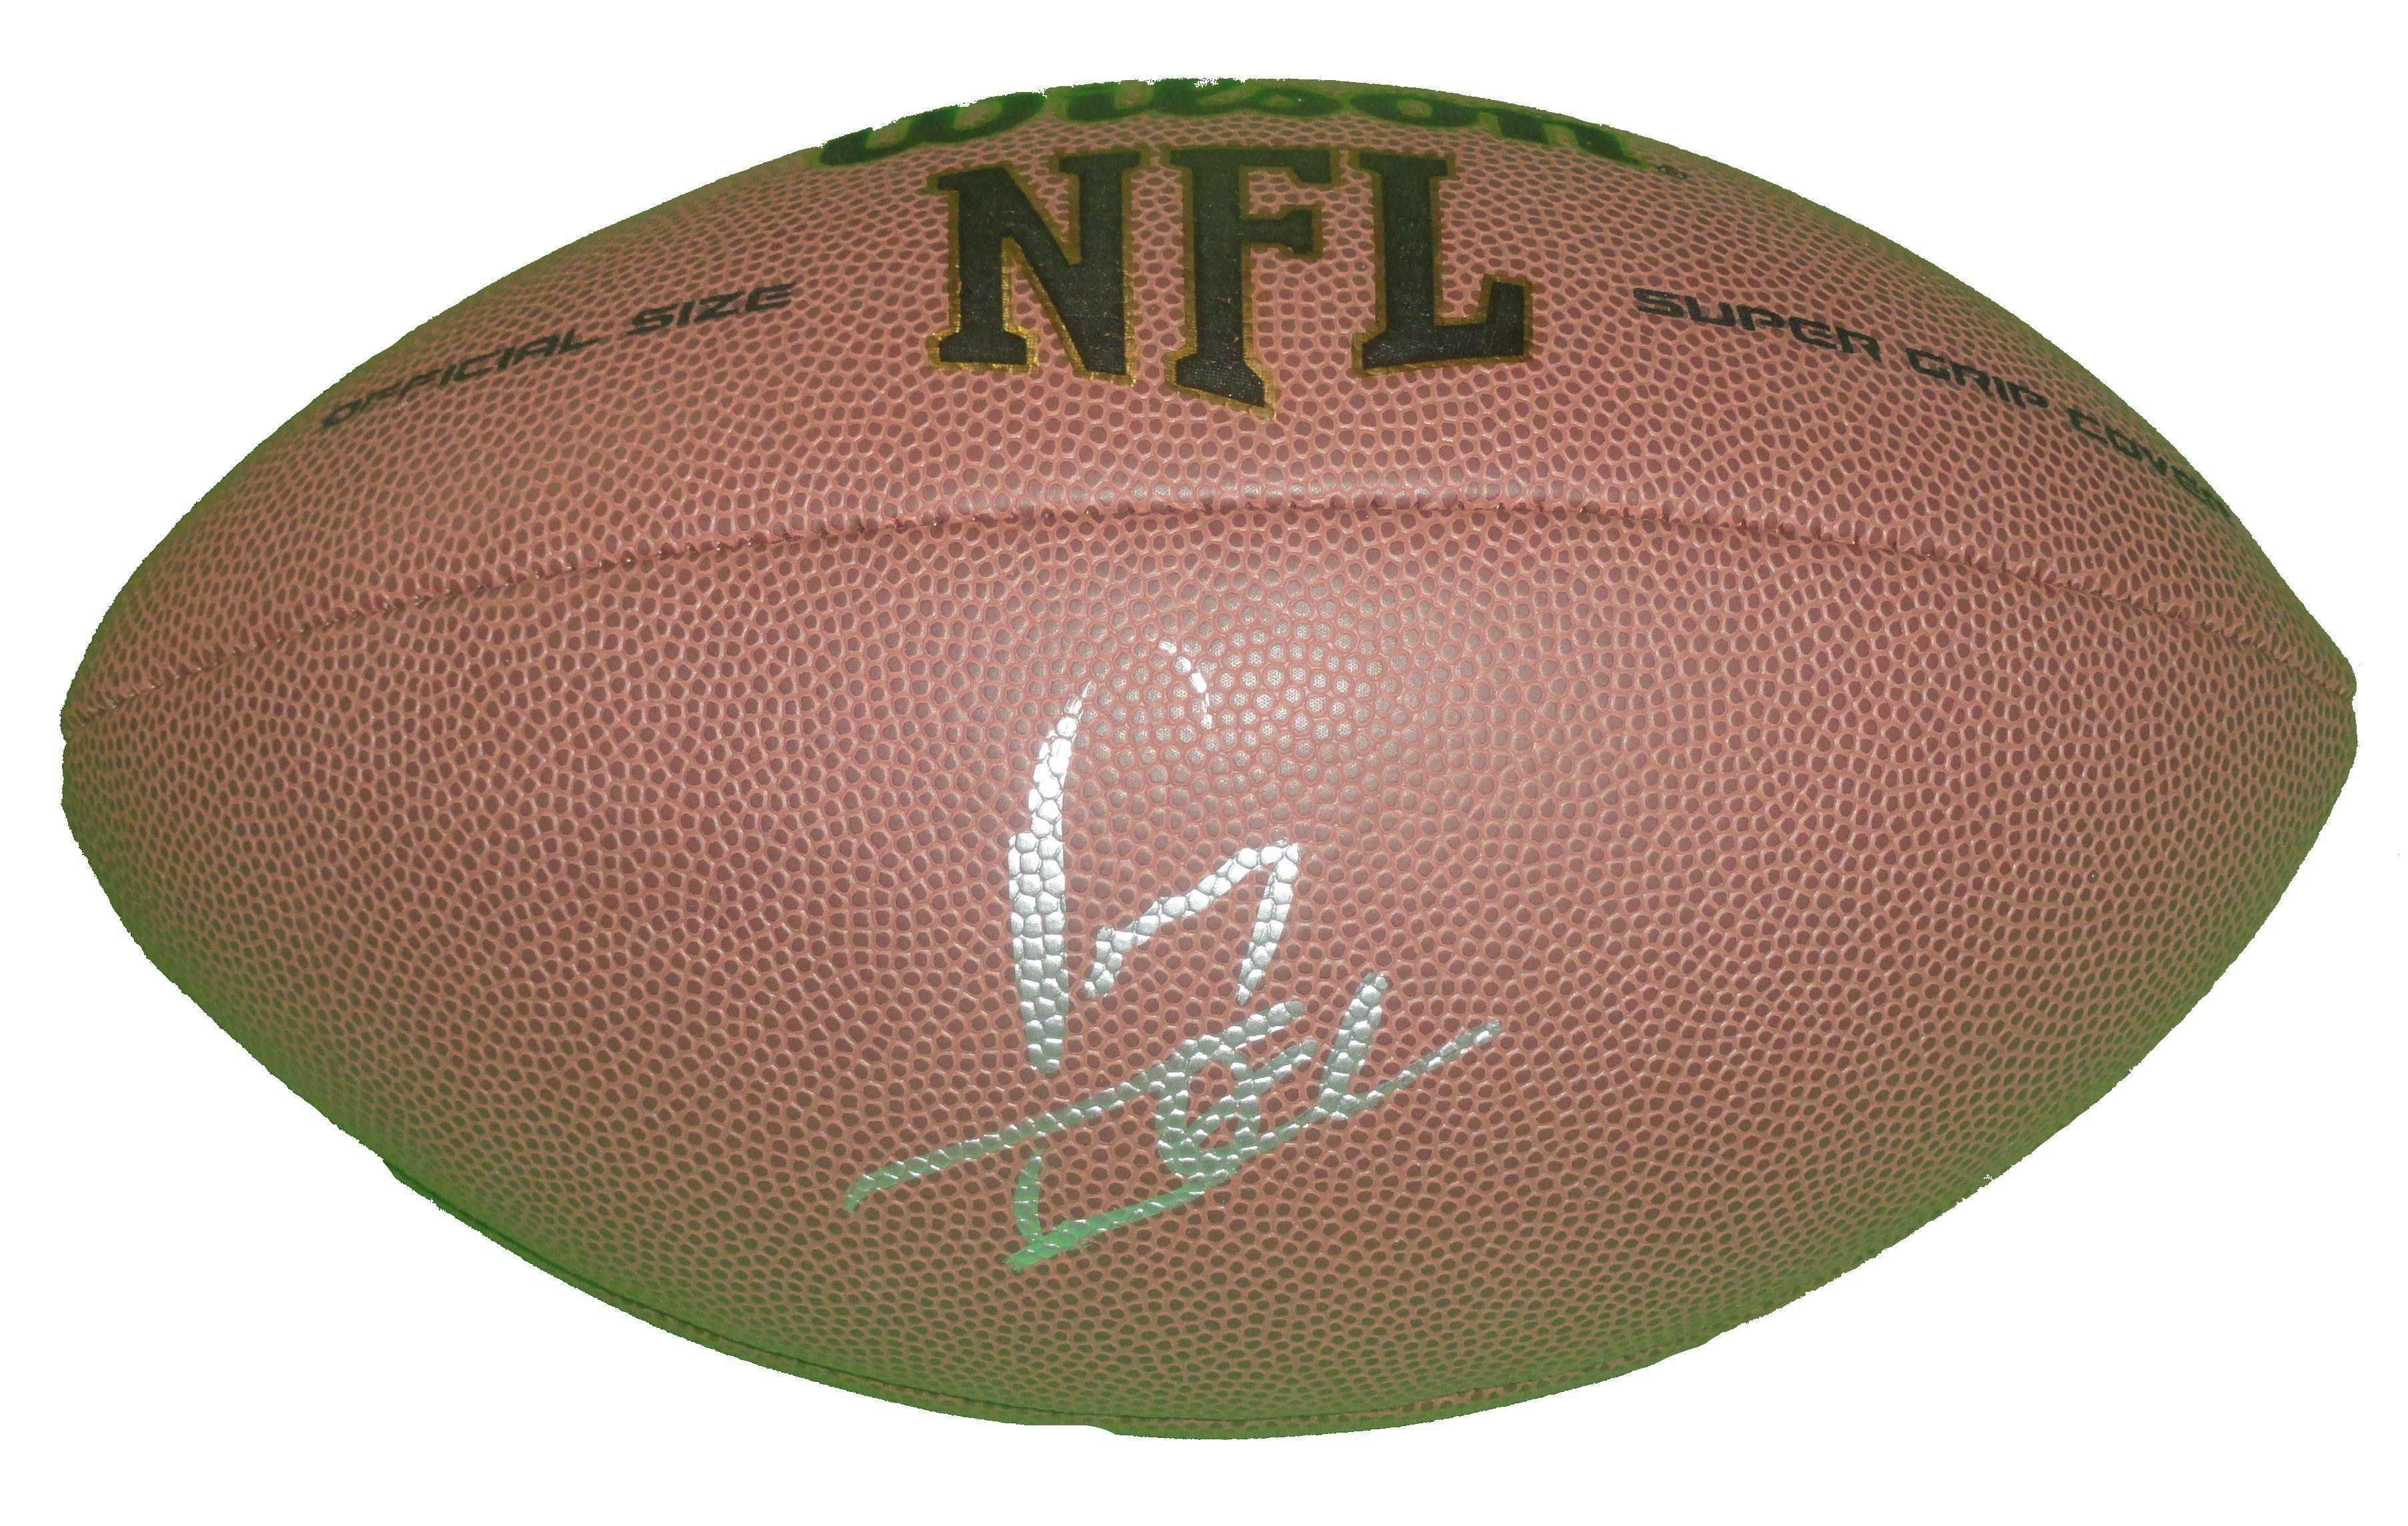 Vinny Testaverde Signed NFL Football, New York Jets